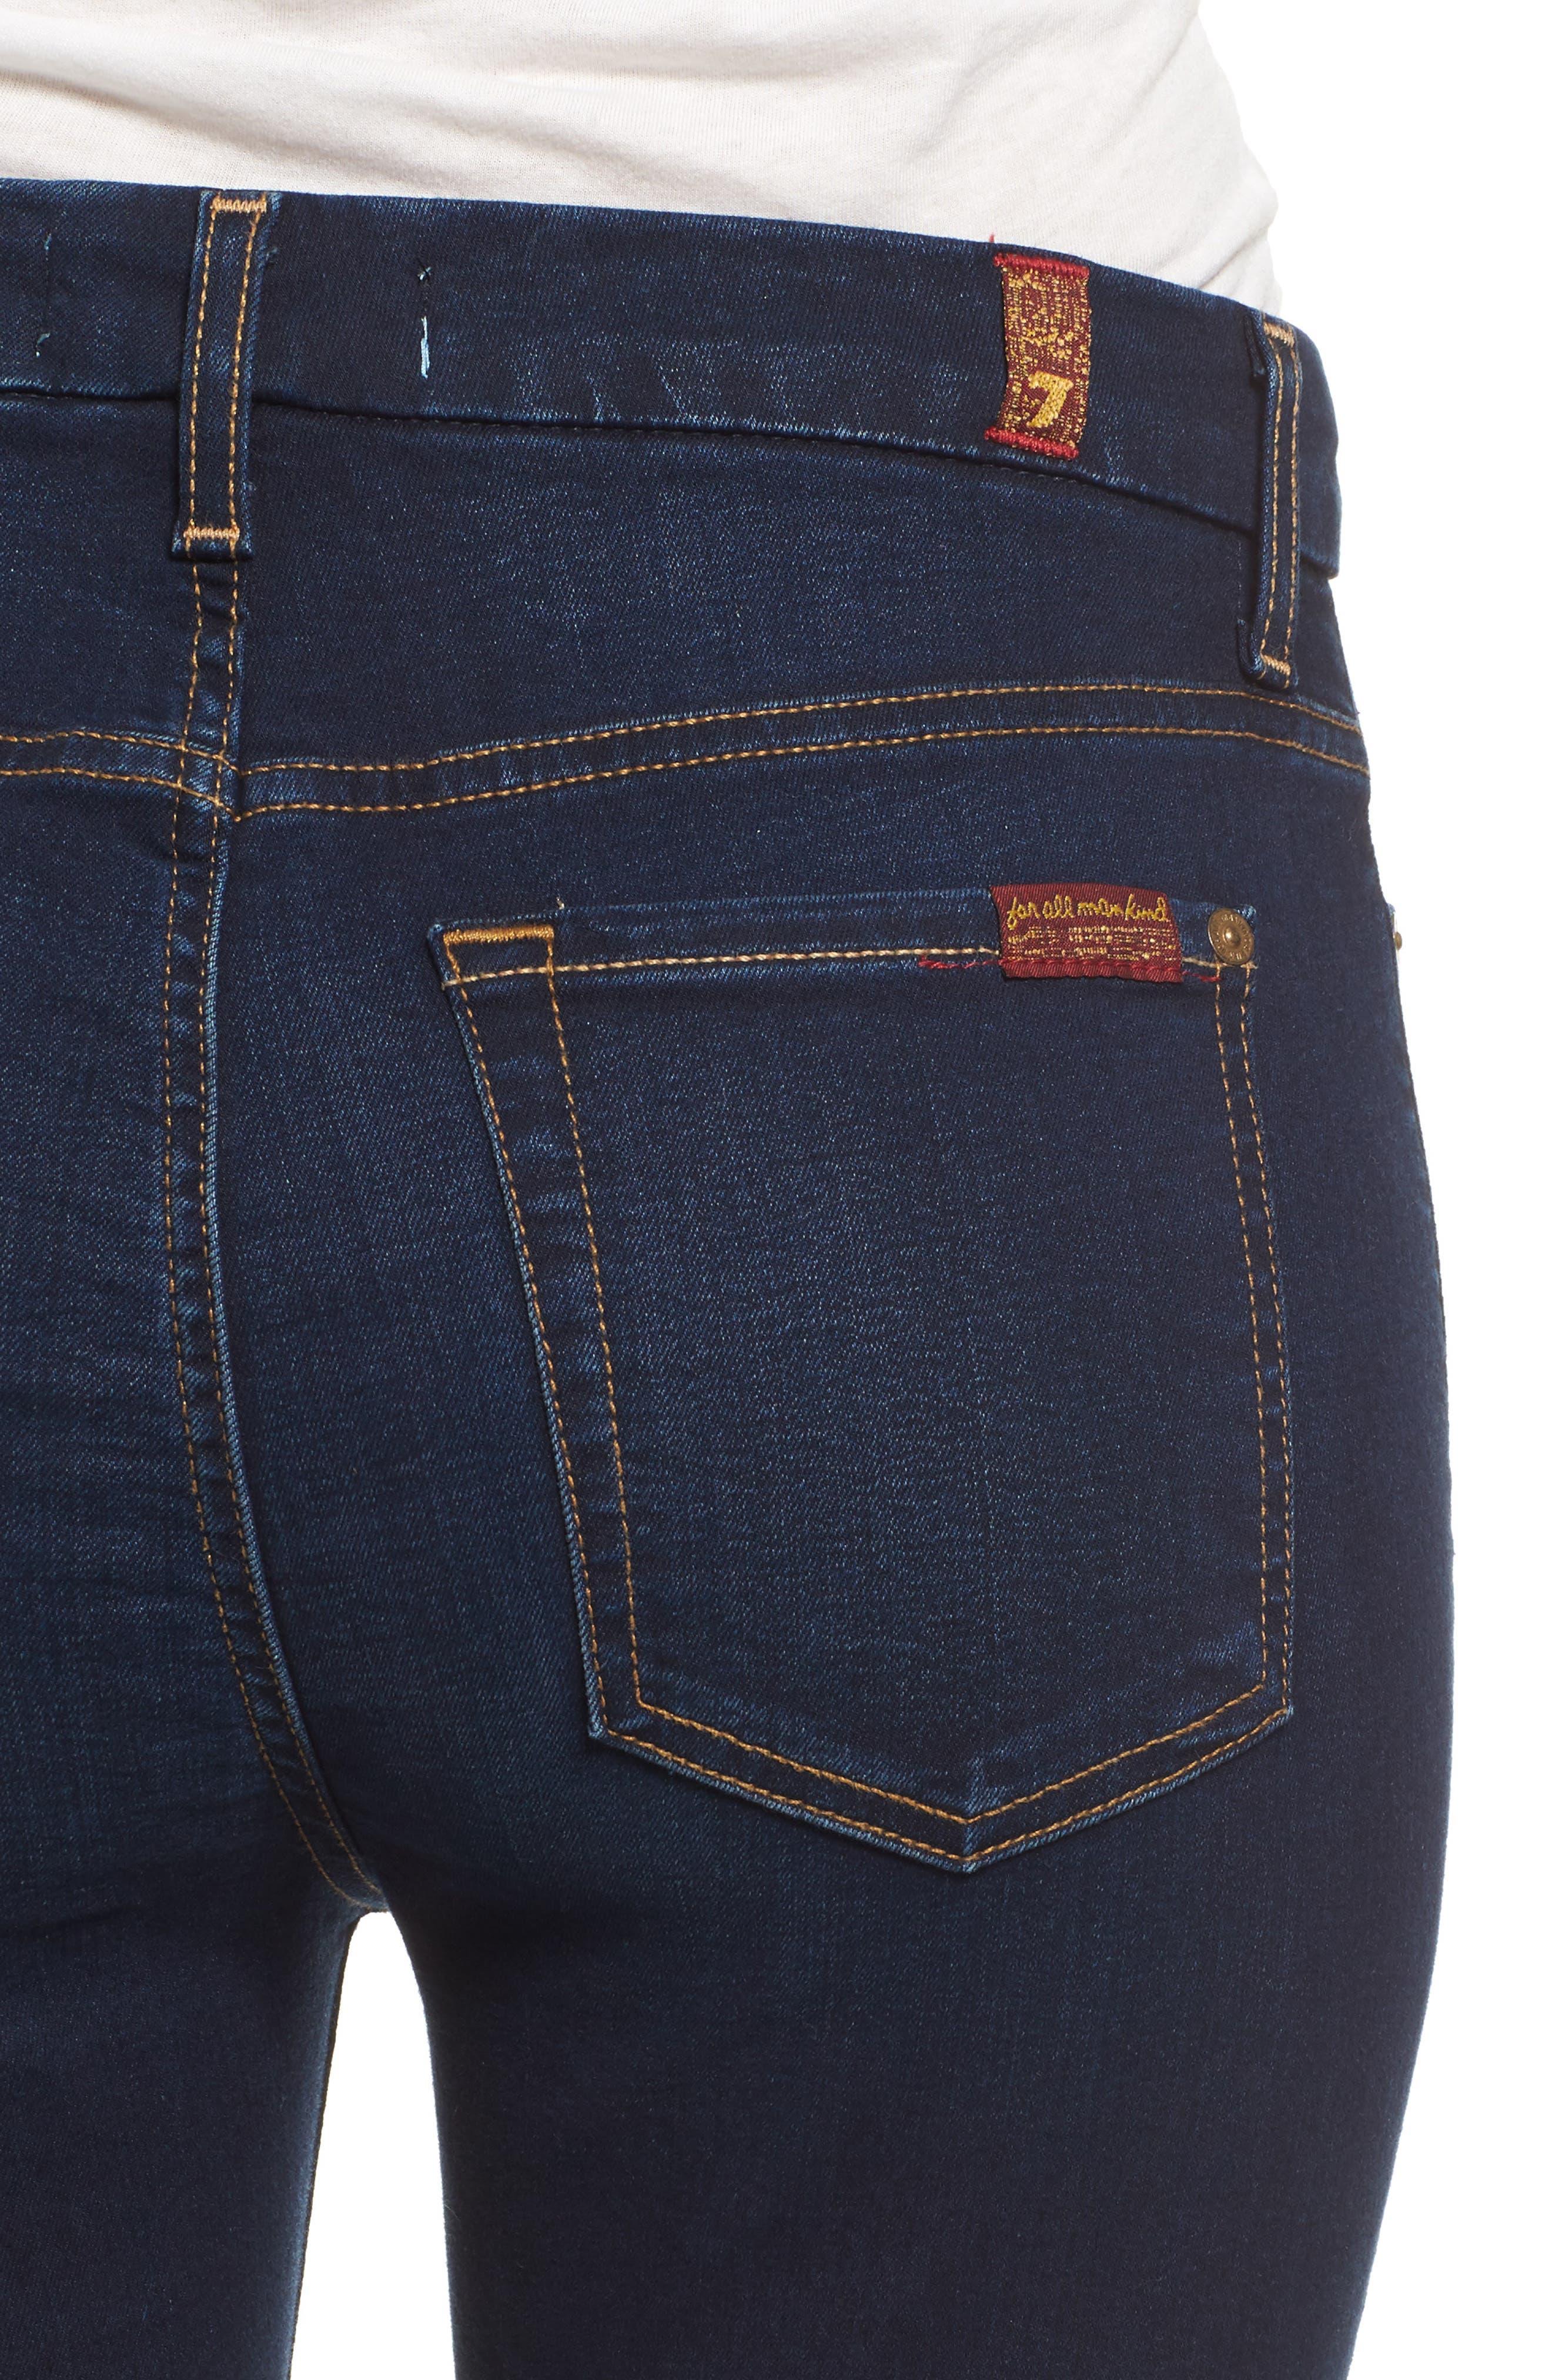 b(air) High Waist Skinny Jeans,                             Alternate thumbnail 6, color,                             400